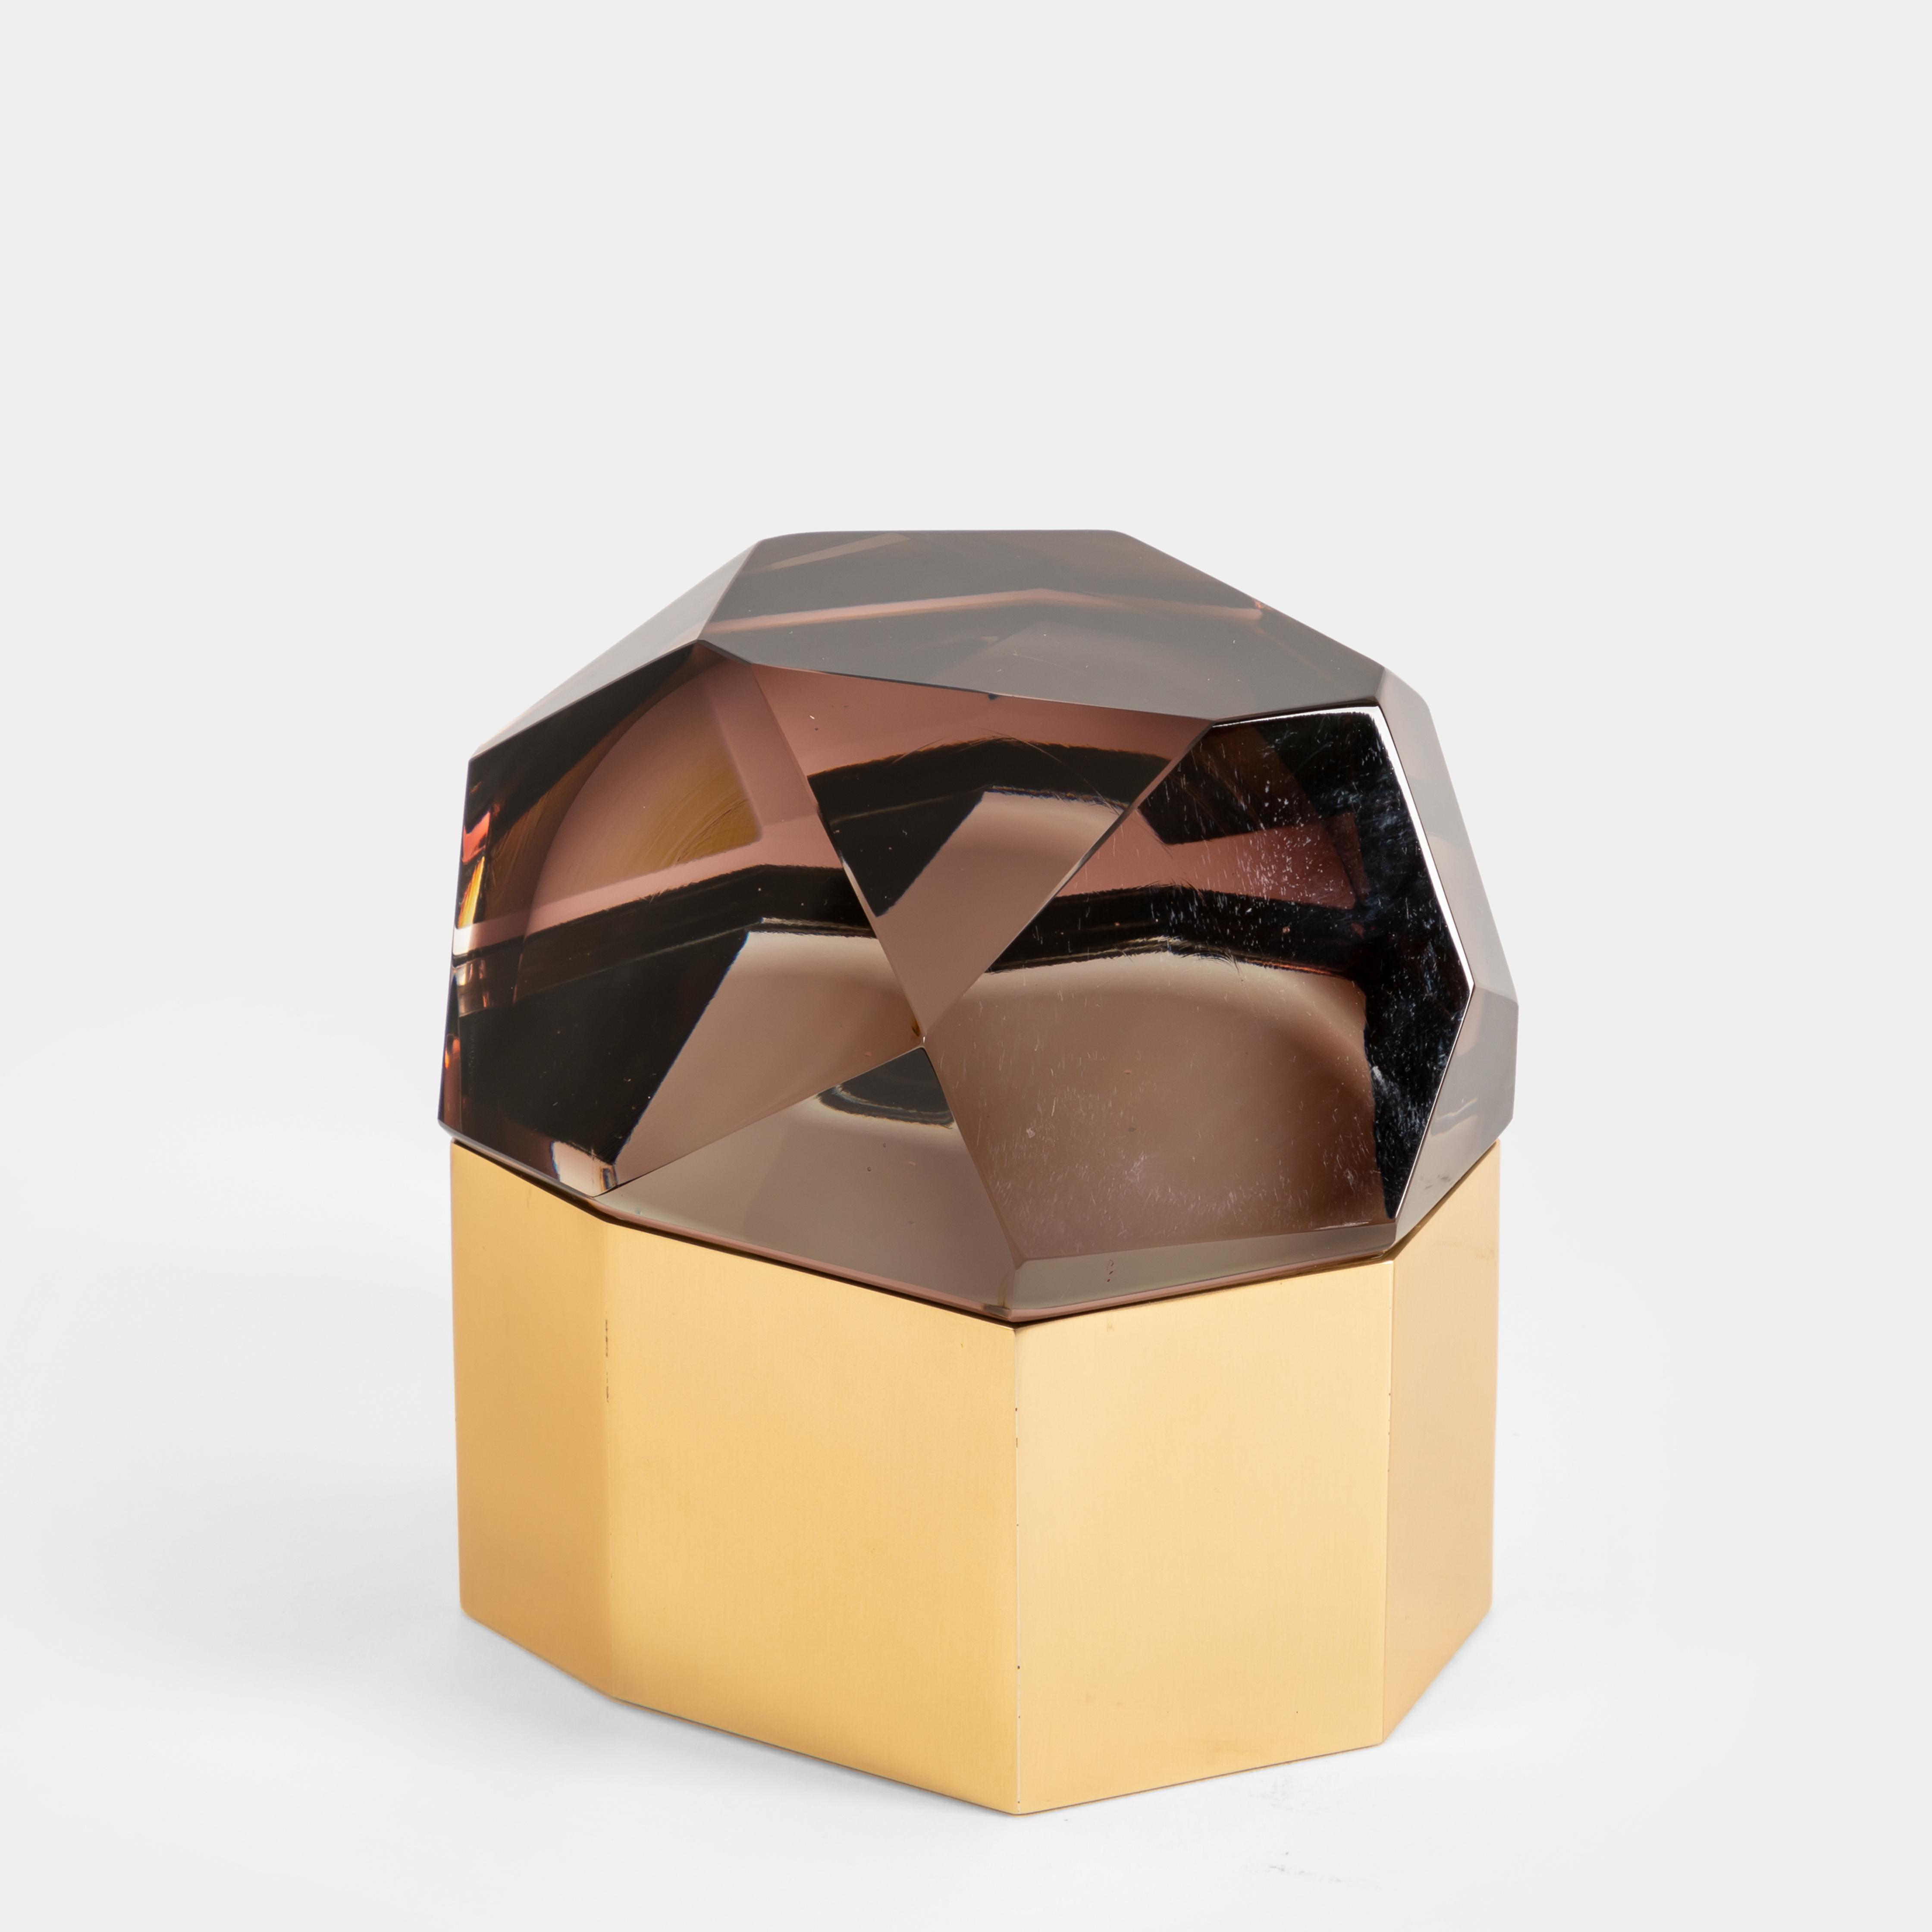 Amethyst 'Diamante Murano' Glass Box by Roberto Giulio Rida | soyun k.